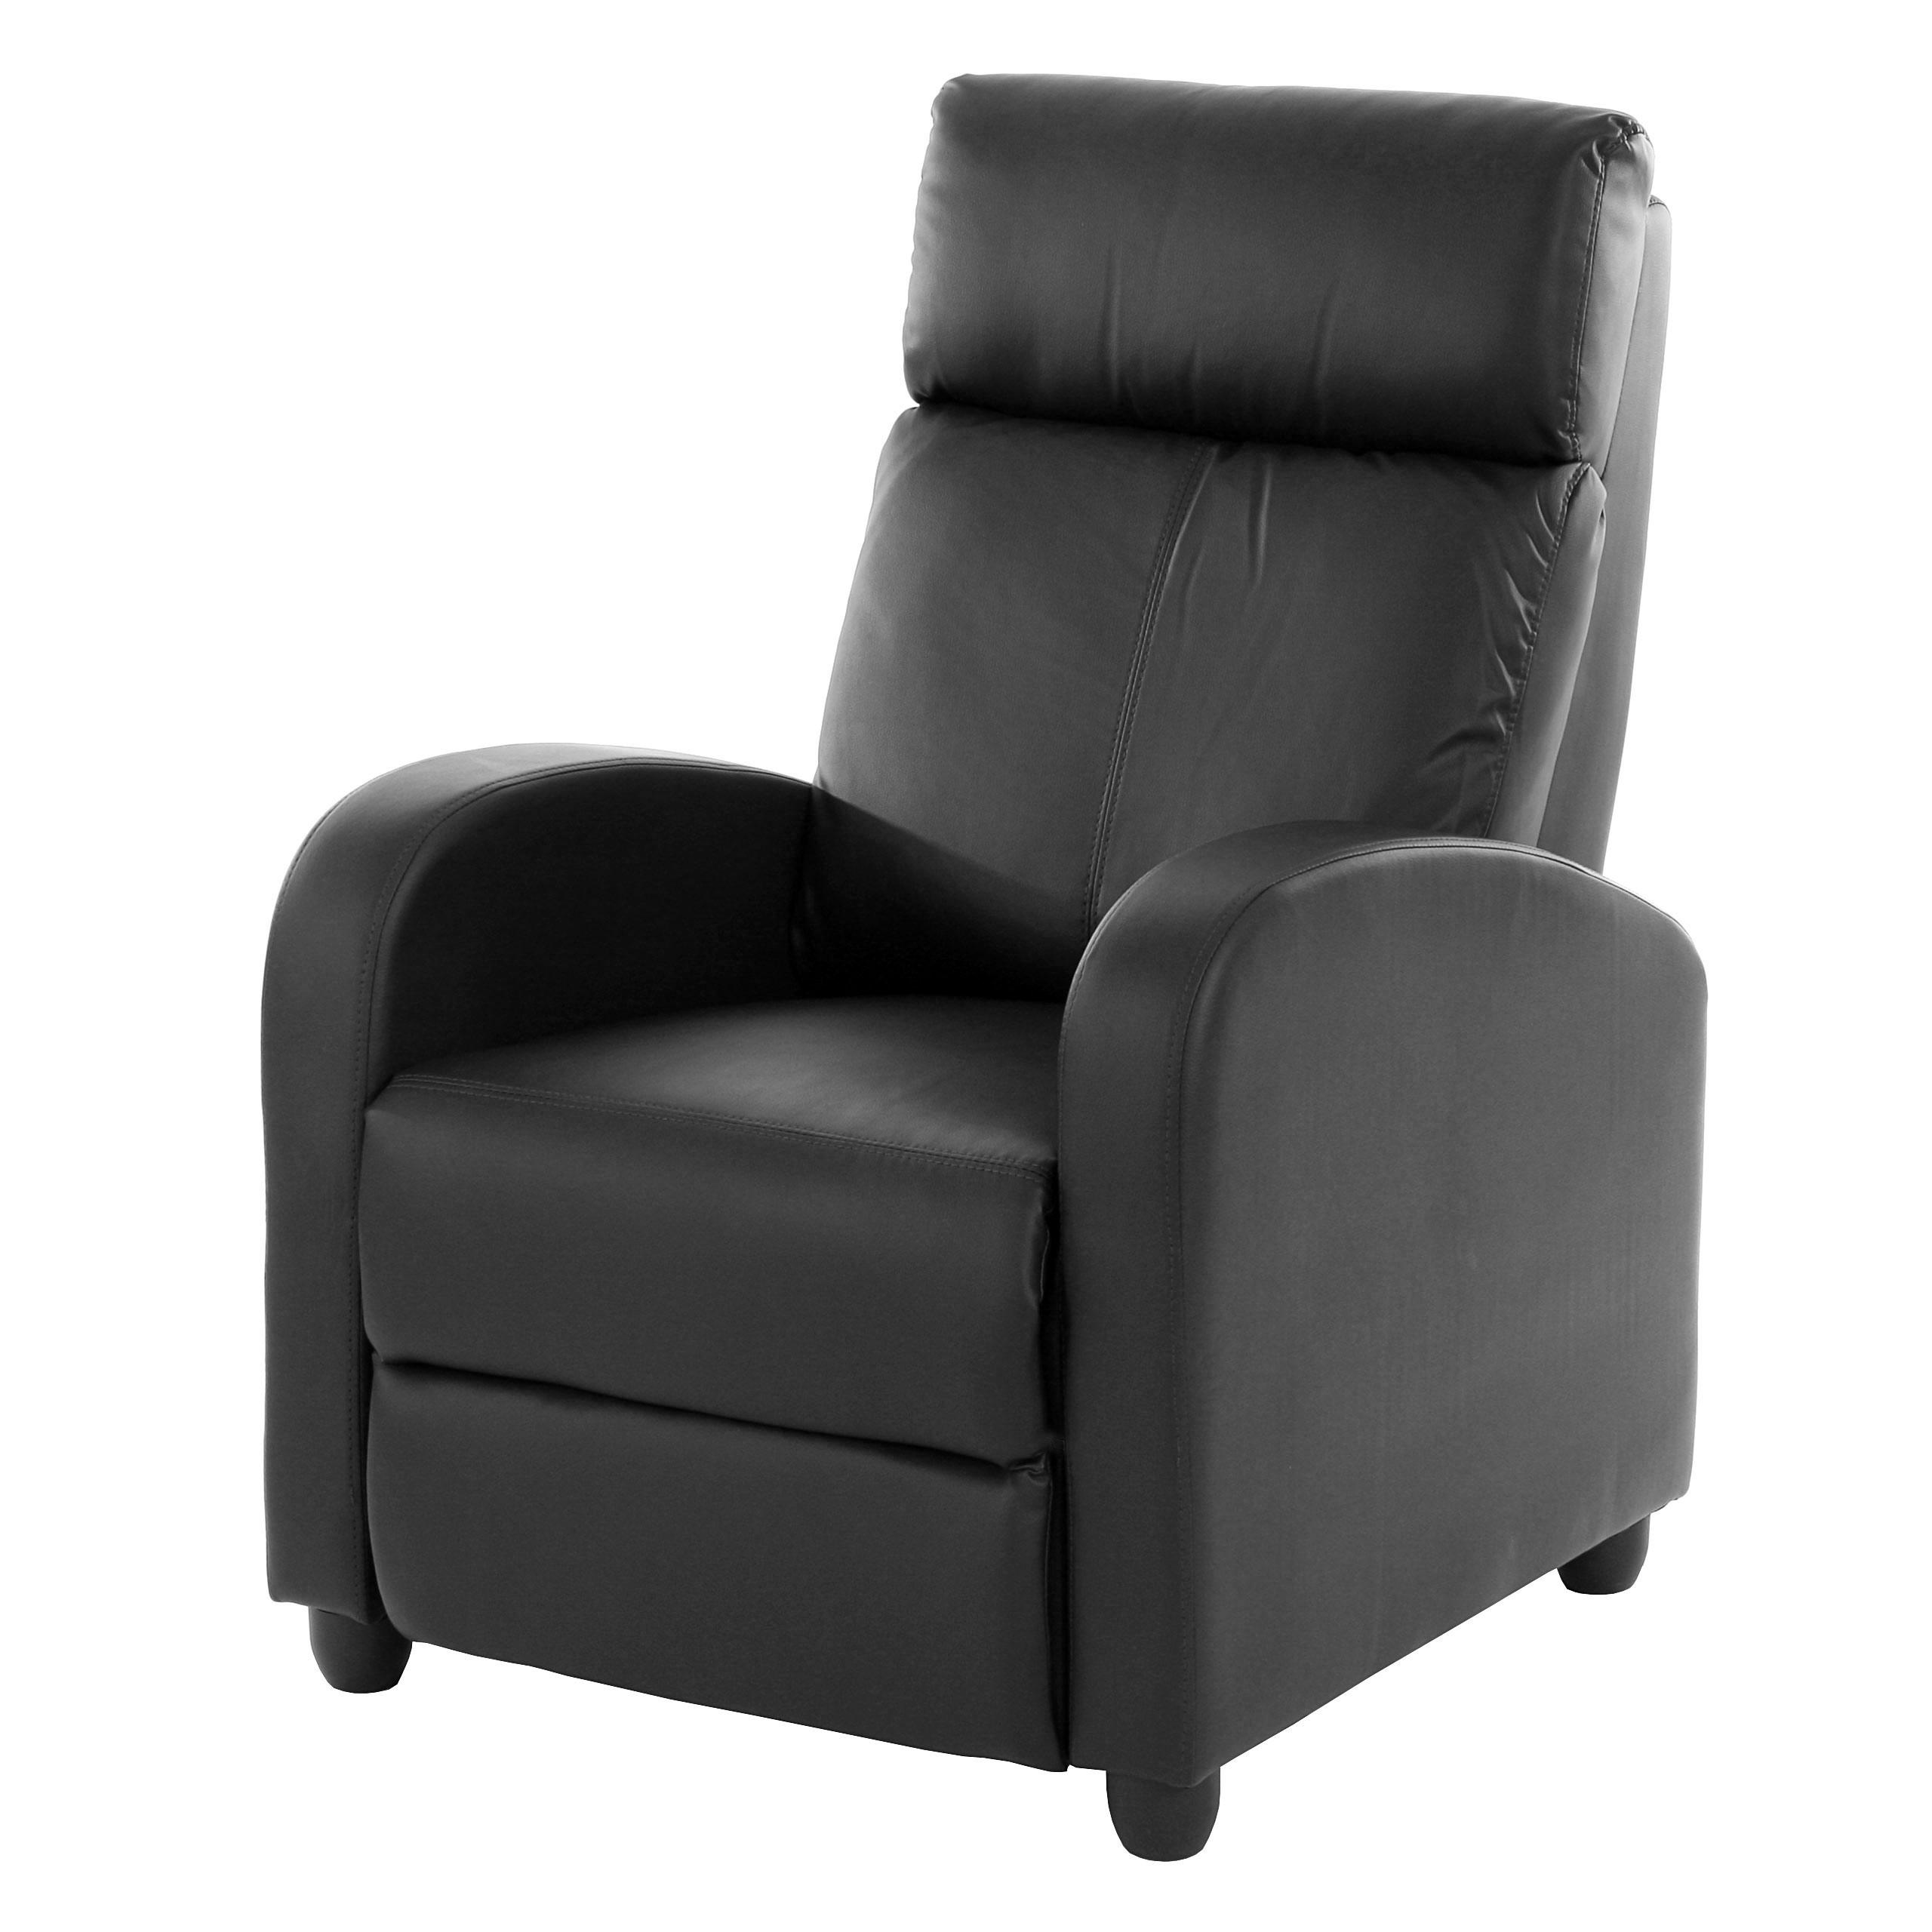 Großartig Relaxsessel Elektrisch Verstellbar Galerie Von Fernsehsessel-relaxsessel-relaxliege-sessel-denver-kunstleder